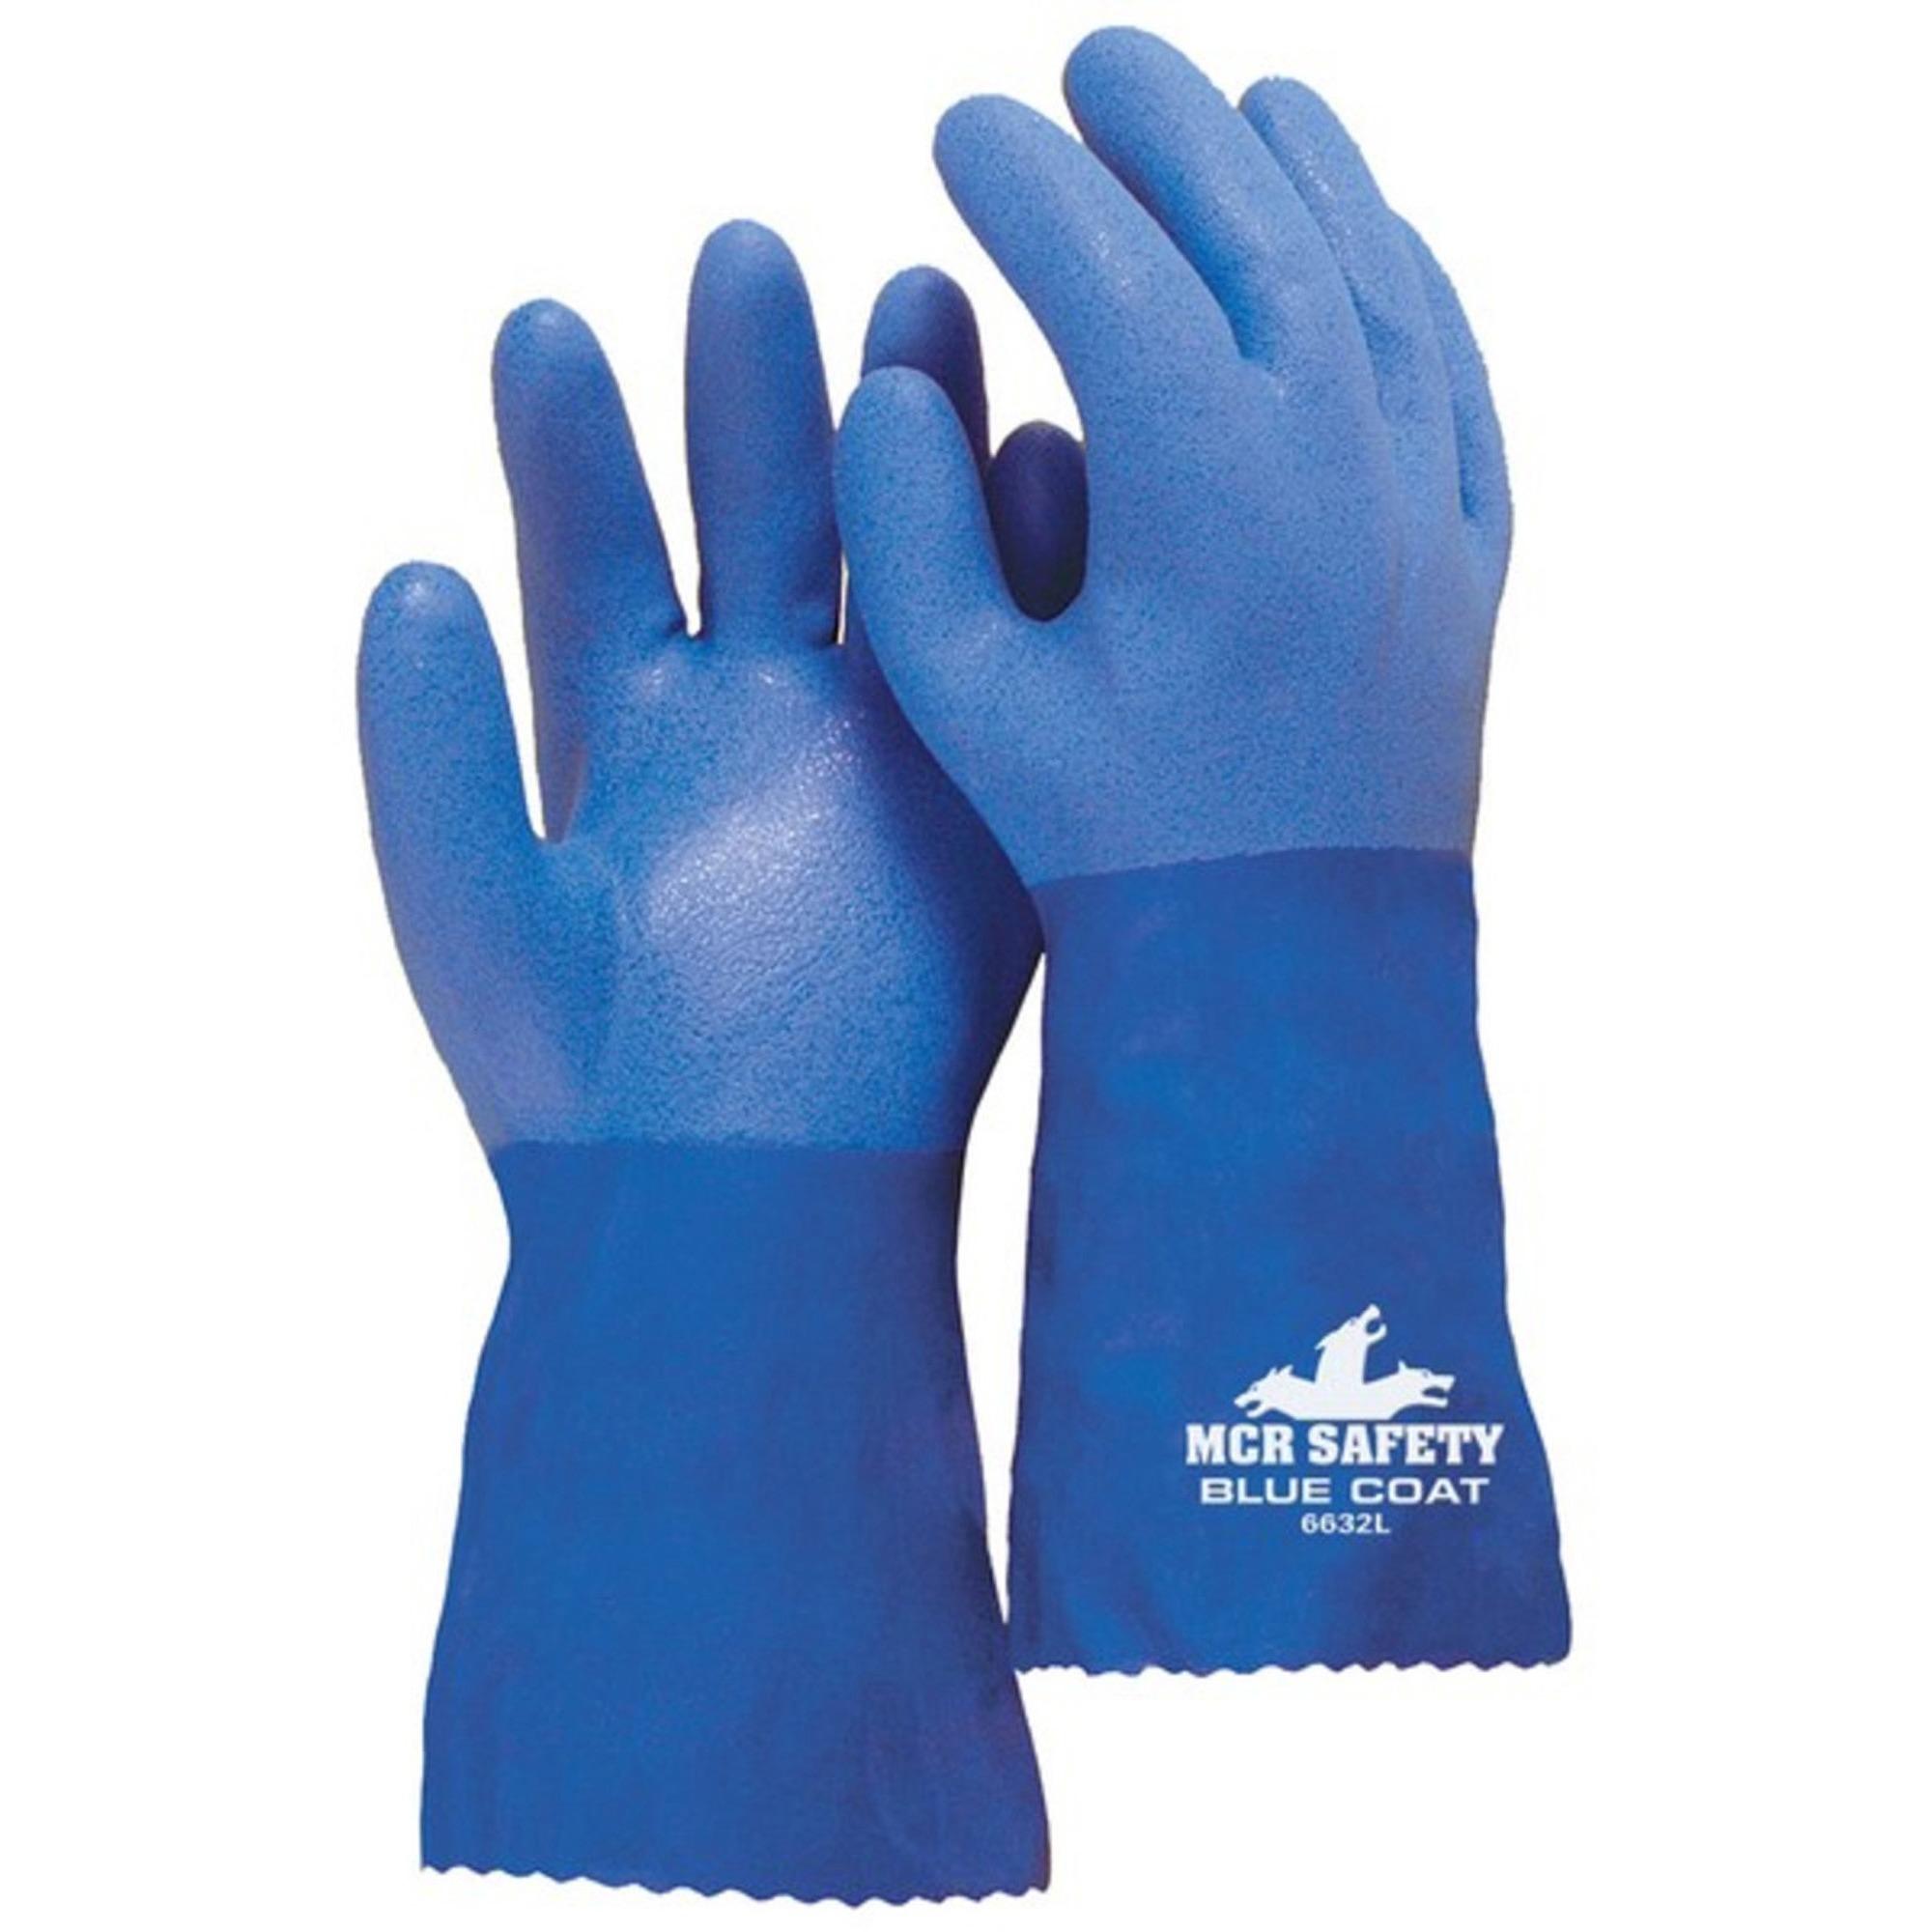 MCR Safety Blue Coat Seamless Gloves - Large Size - Polyvinyl Chloride (PVC) - Blue - Seamless - 2 / Pair